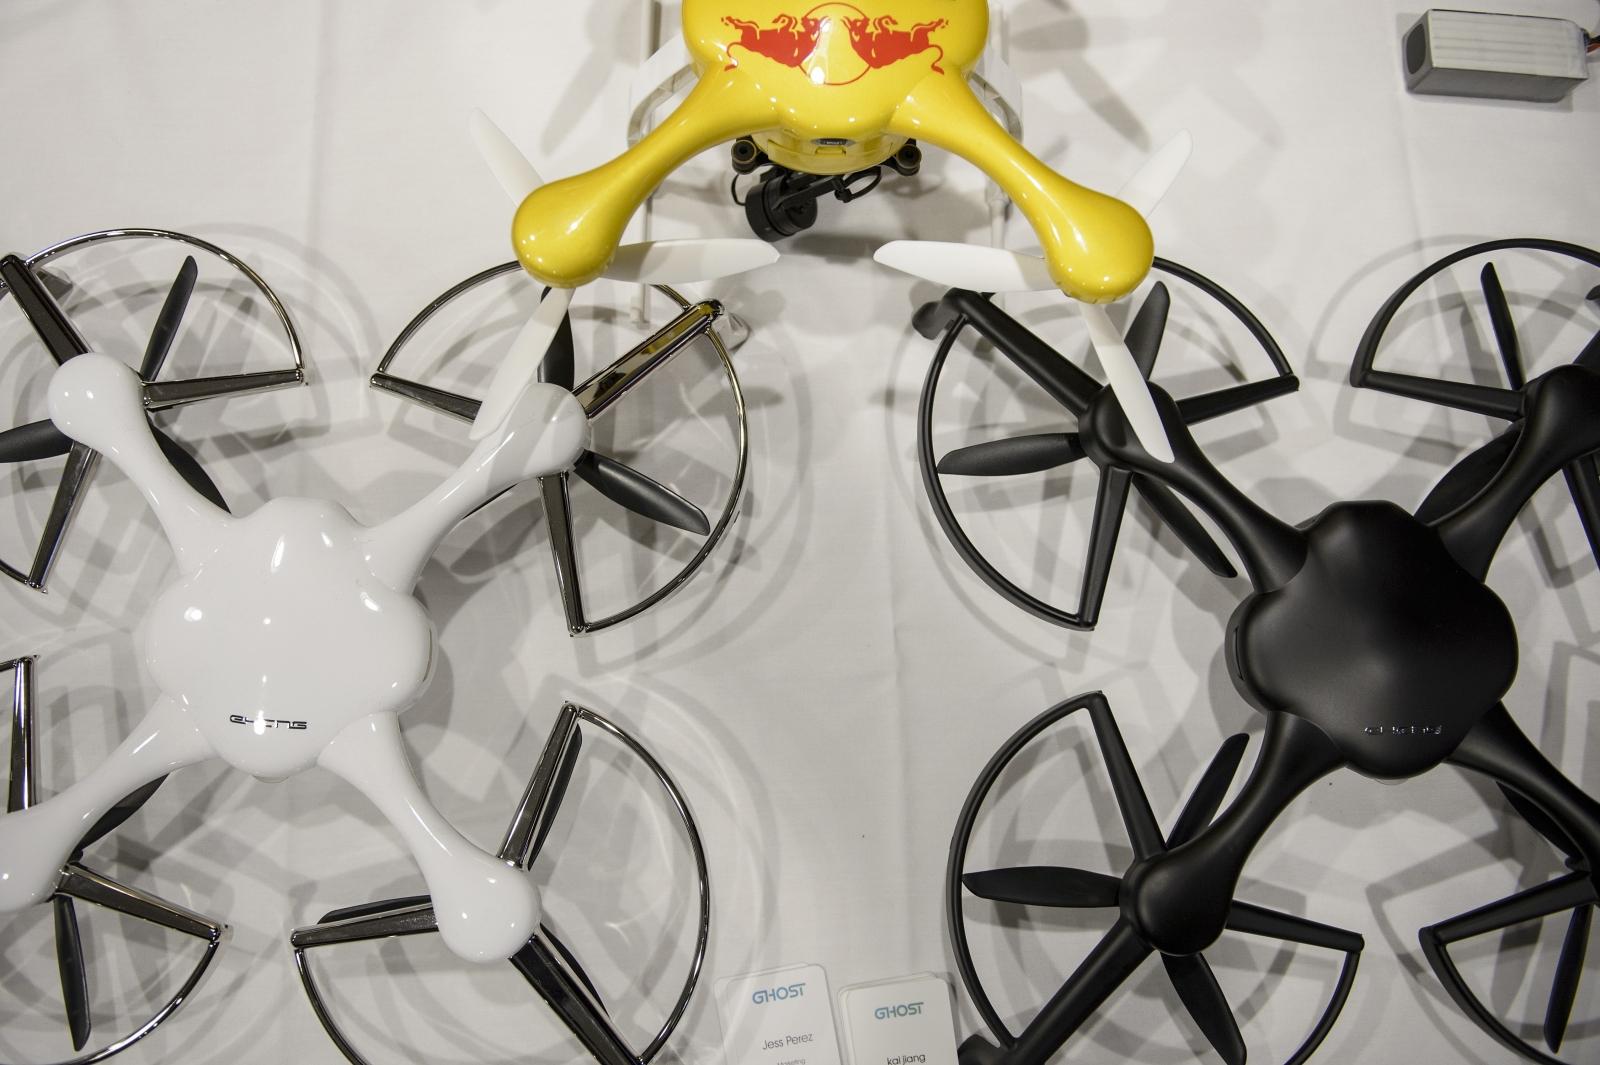 Drones at a UAV exhibition in USA